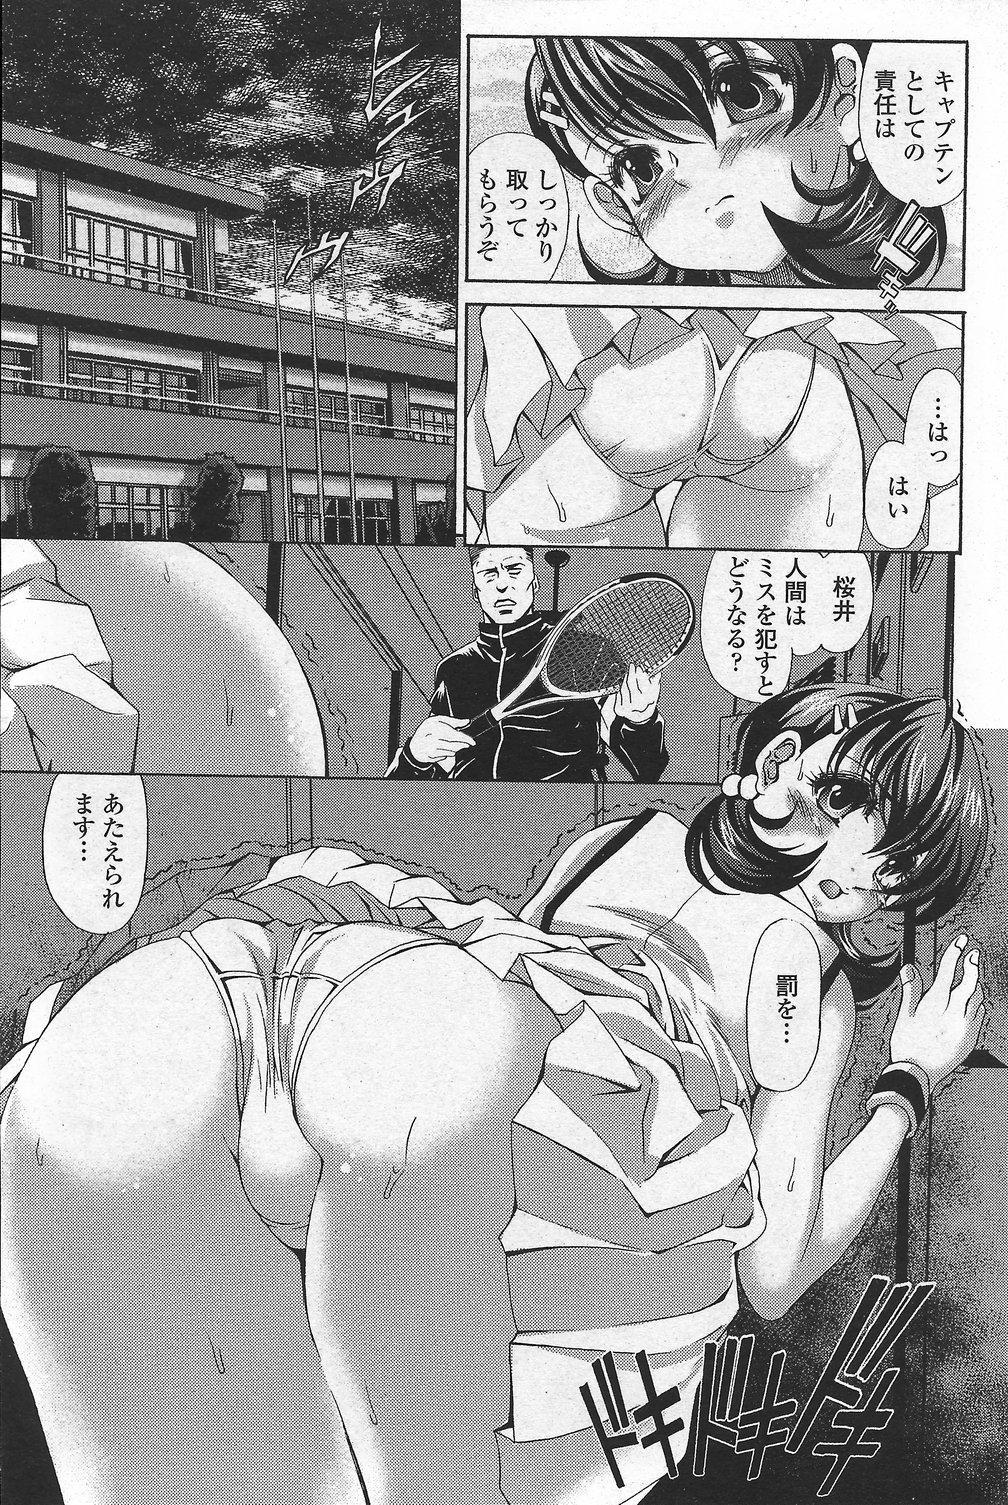 COMIC Penguin Club Sanzokuban 2007-10 Vol. 225 198